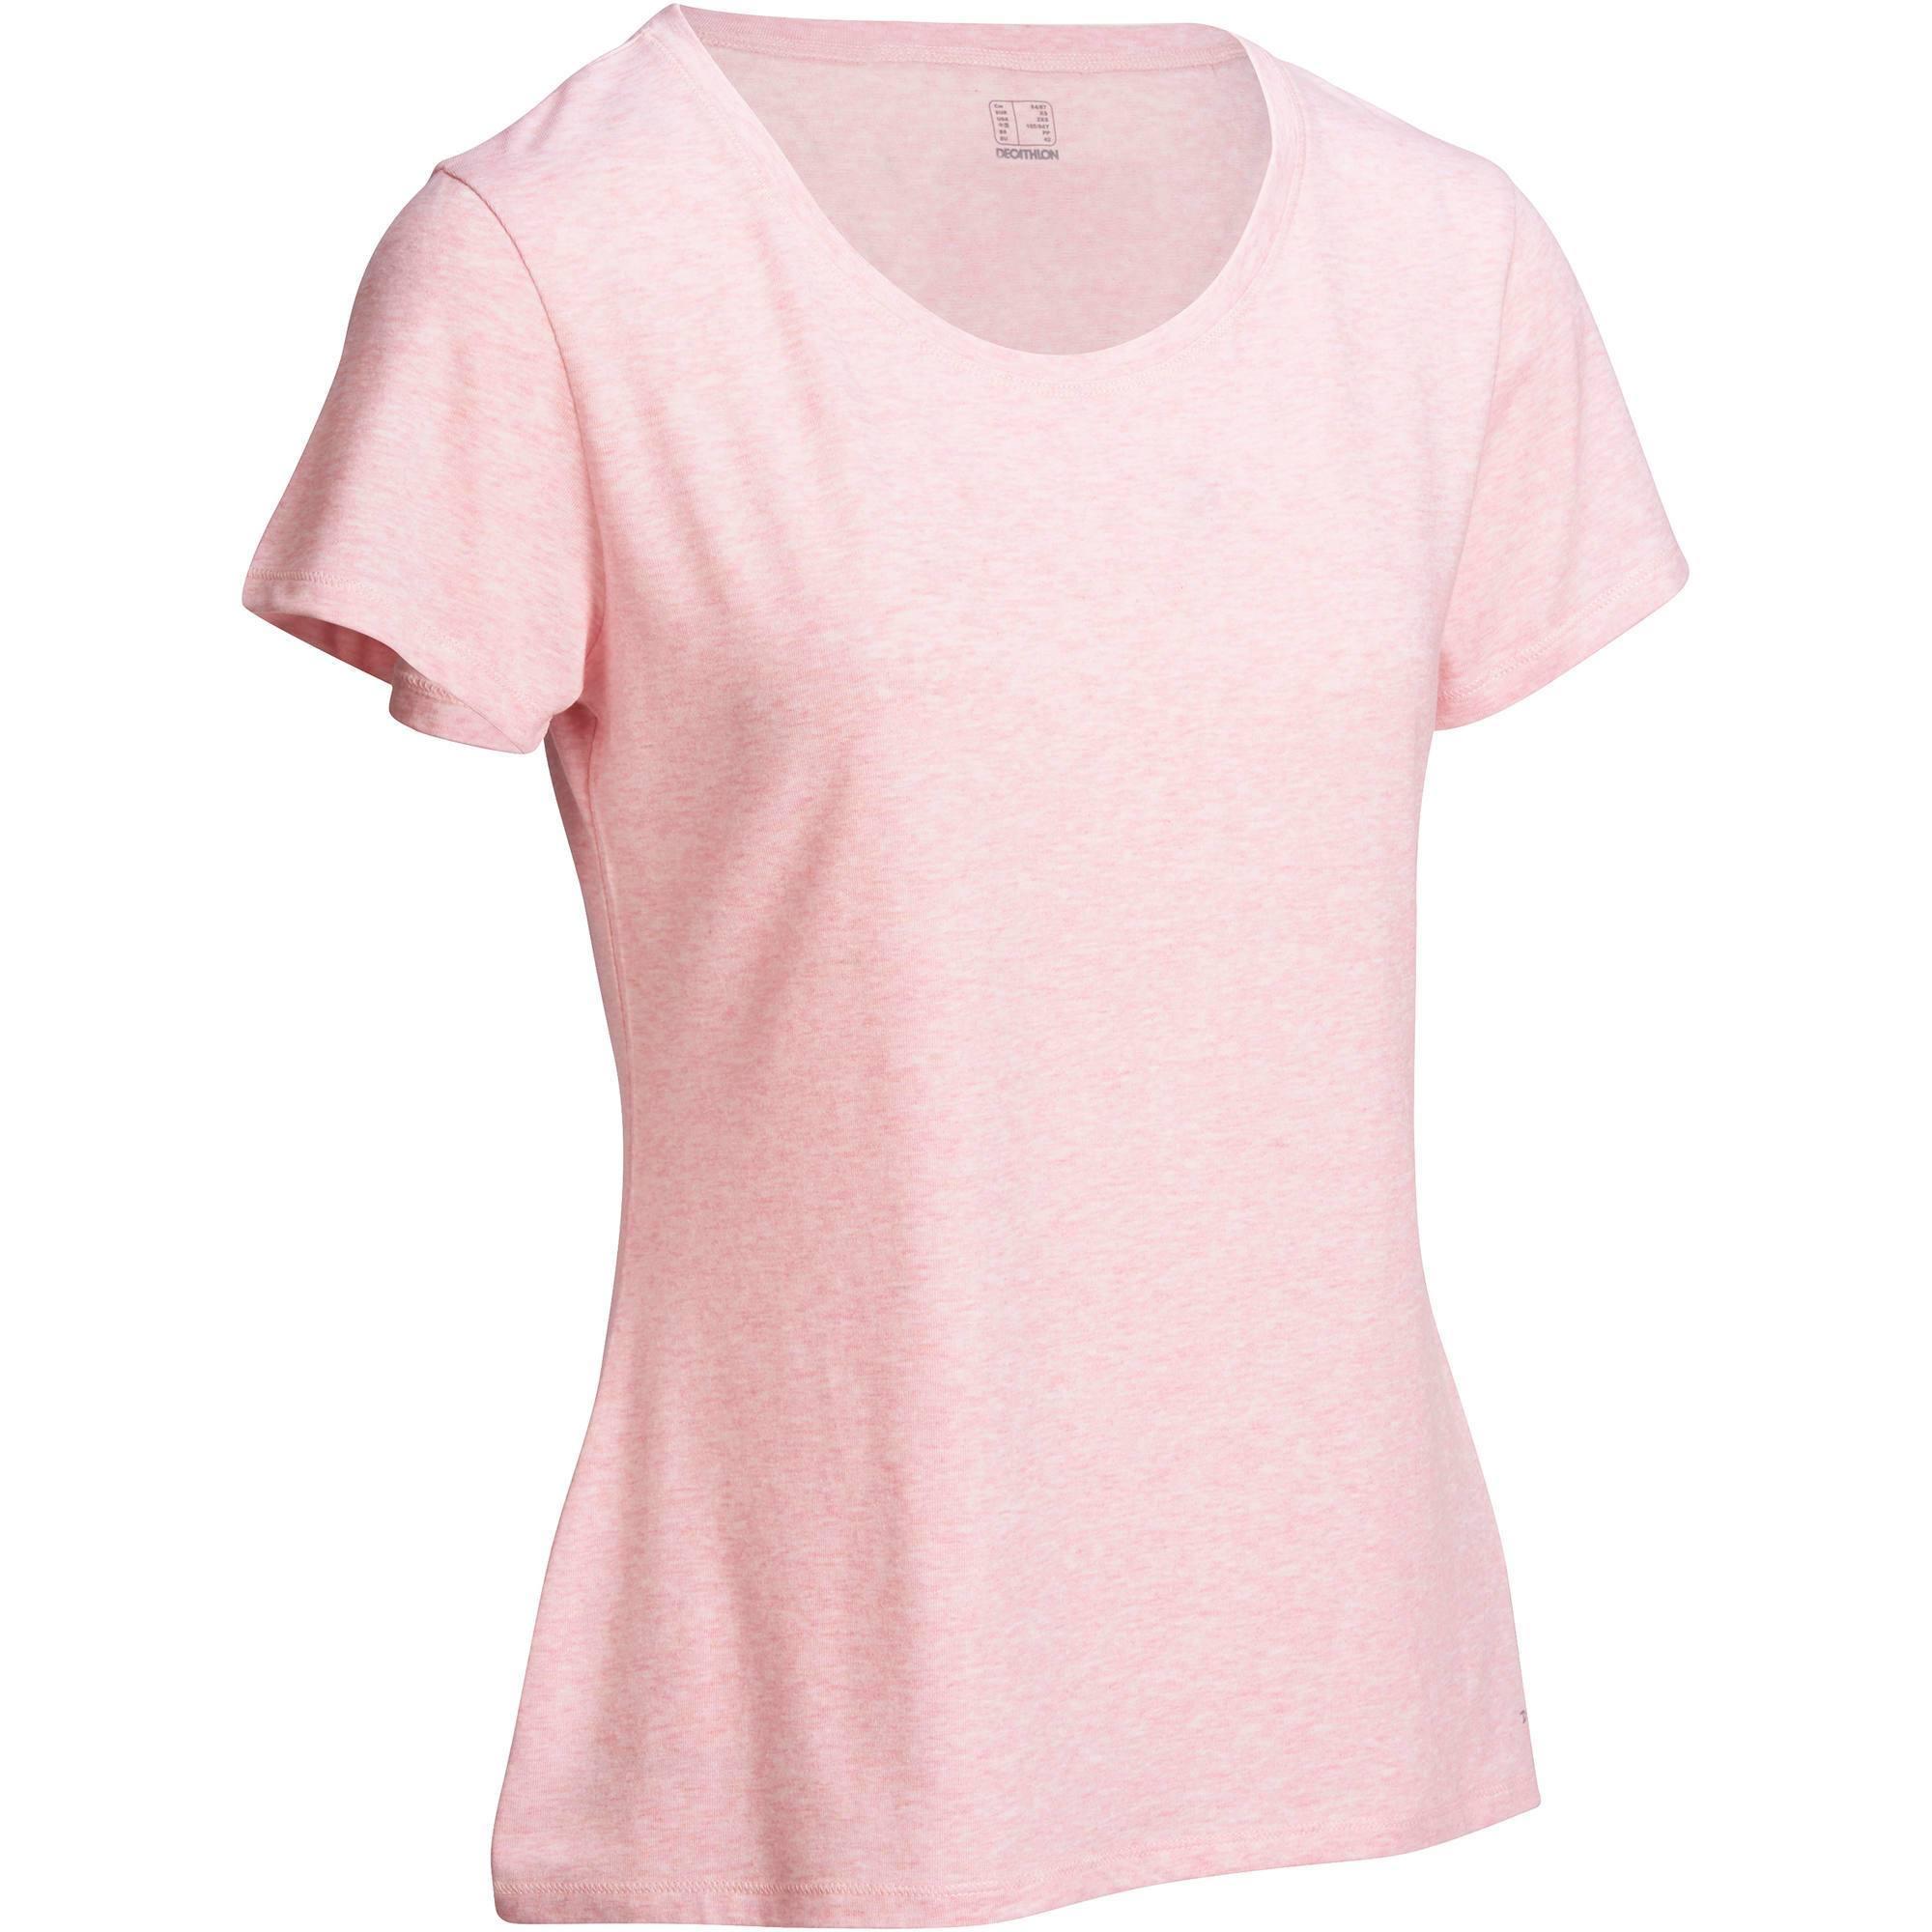 T-Shirt 500 manches courtes régular Gym   Pilates femme rose chiné ... 3cb87b71ab7